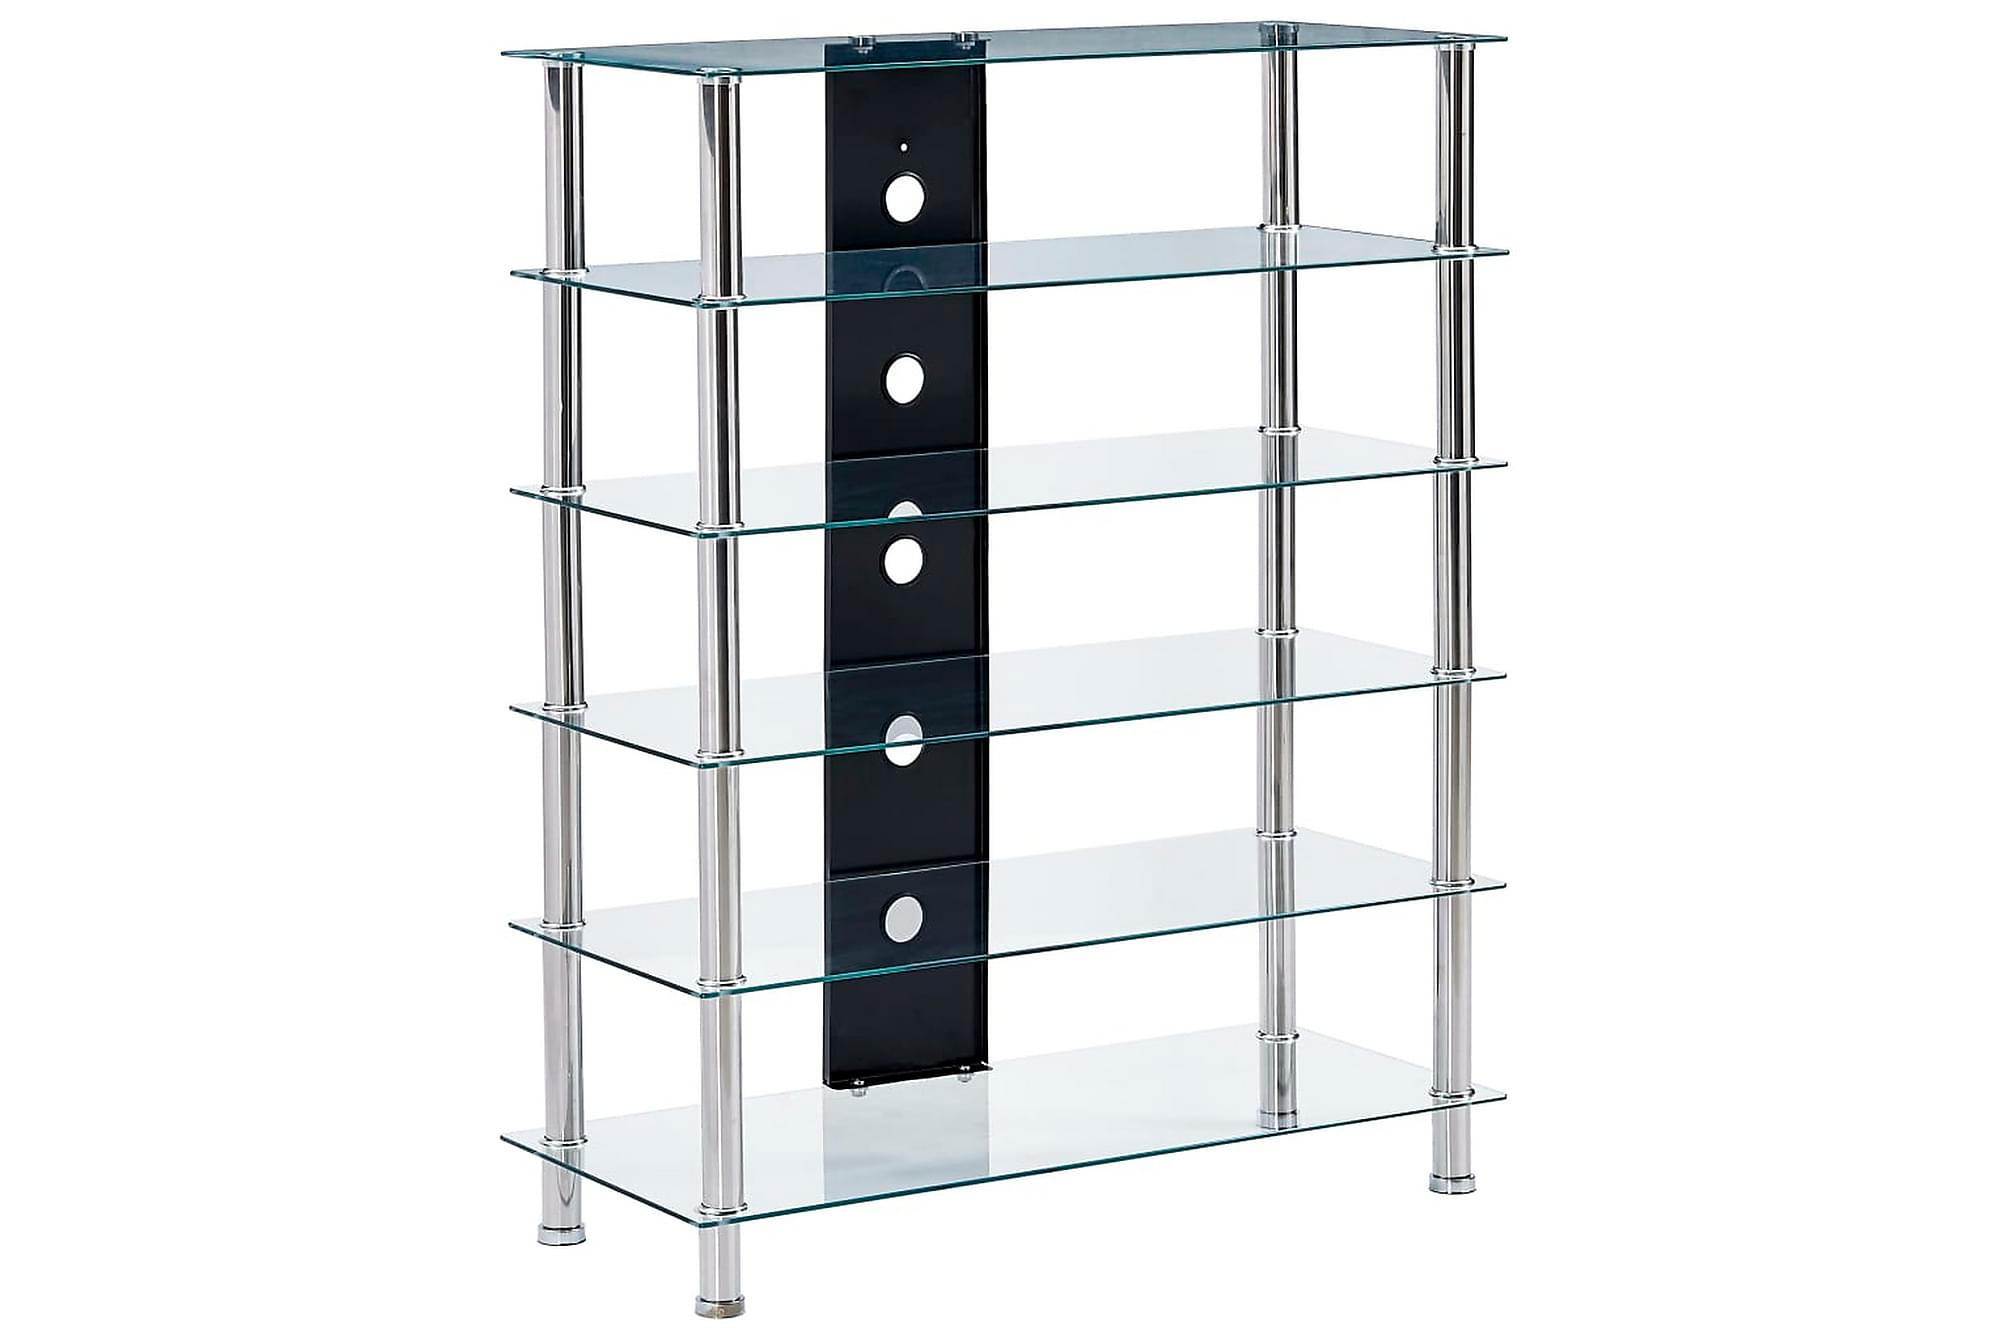 HiFi-bänk transparent 90x40x113 cm härdat glas